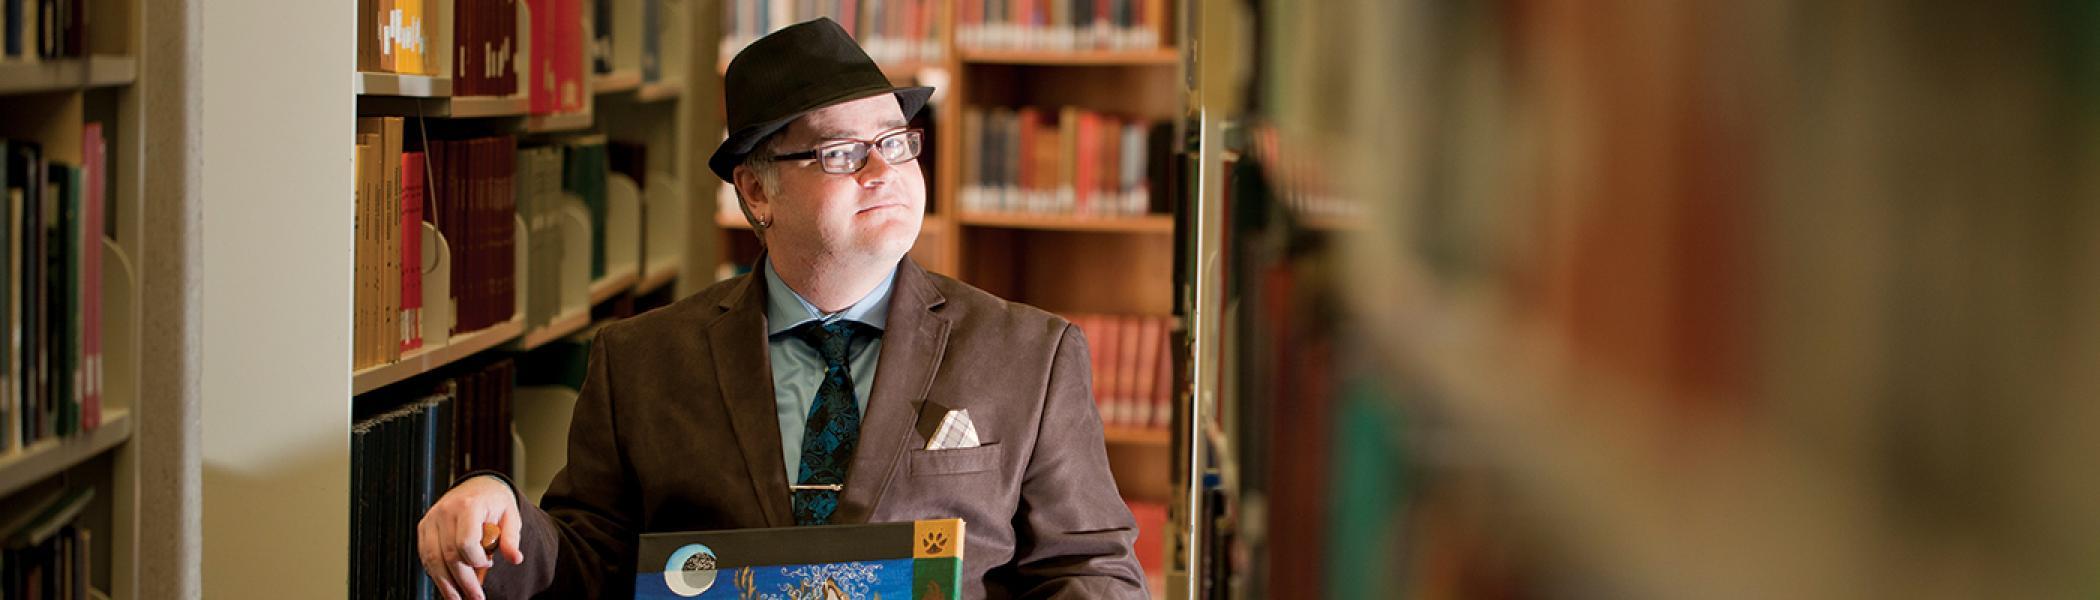 PhD Student Derek Newman-Stille sitting in the library amongst the bookshelves holding his book